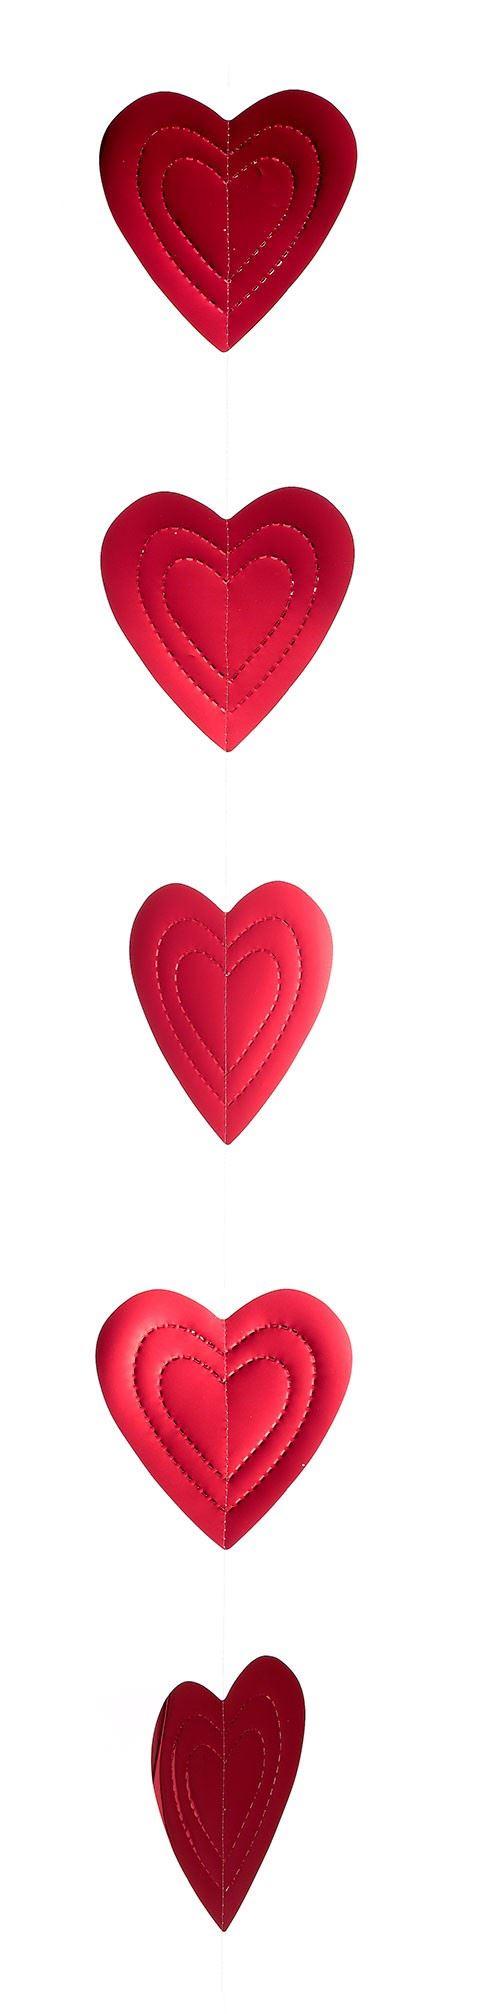 Foil Heart Garland - Pack of 3